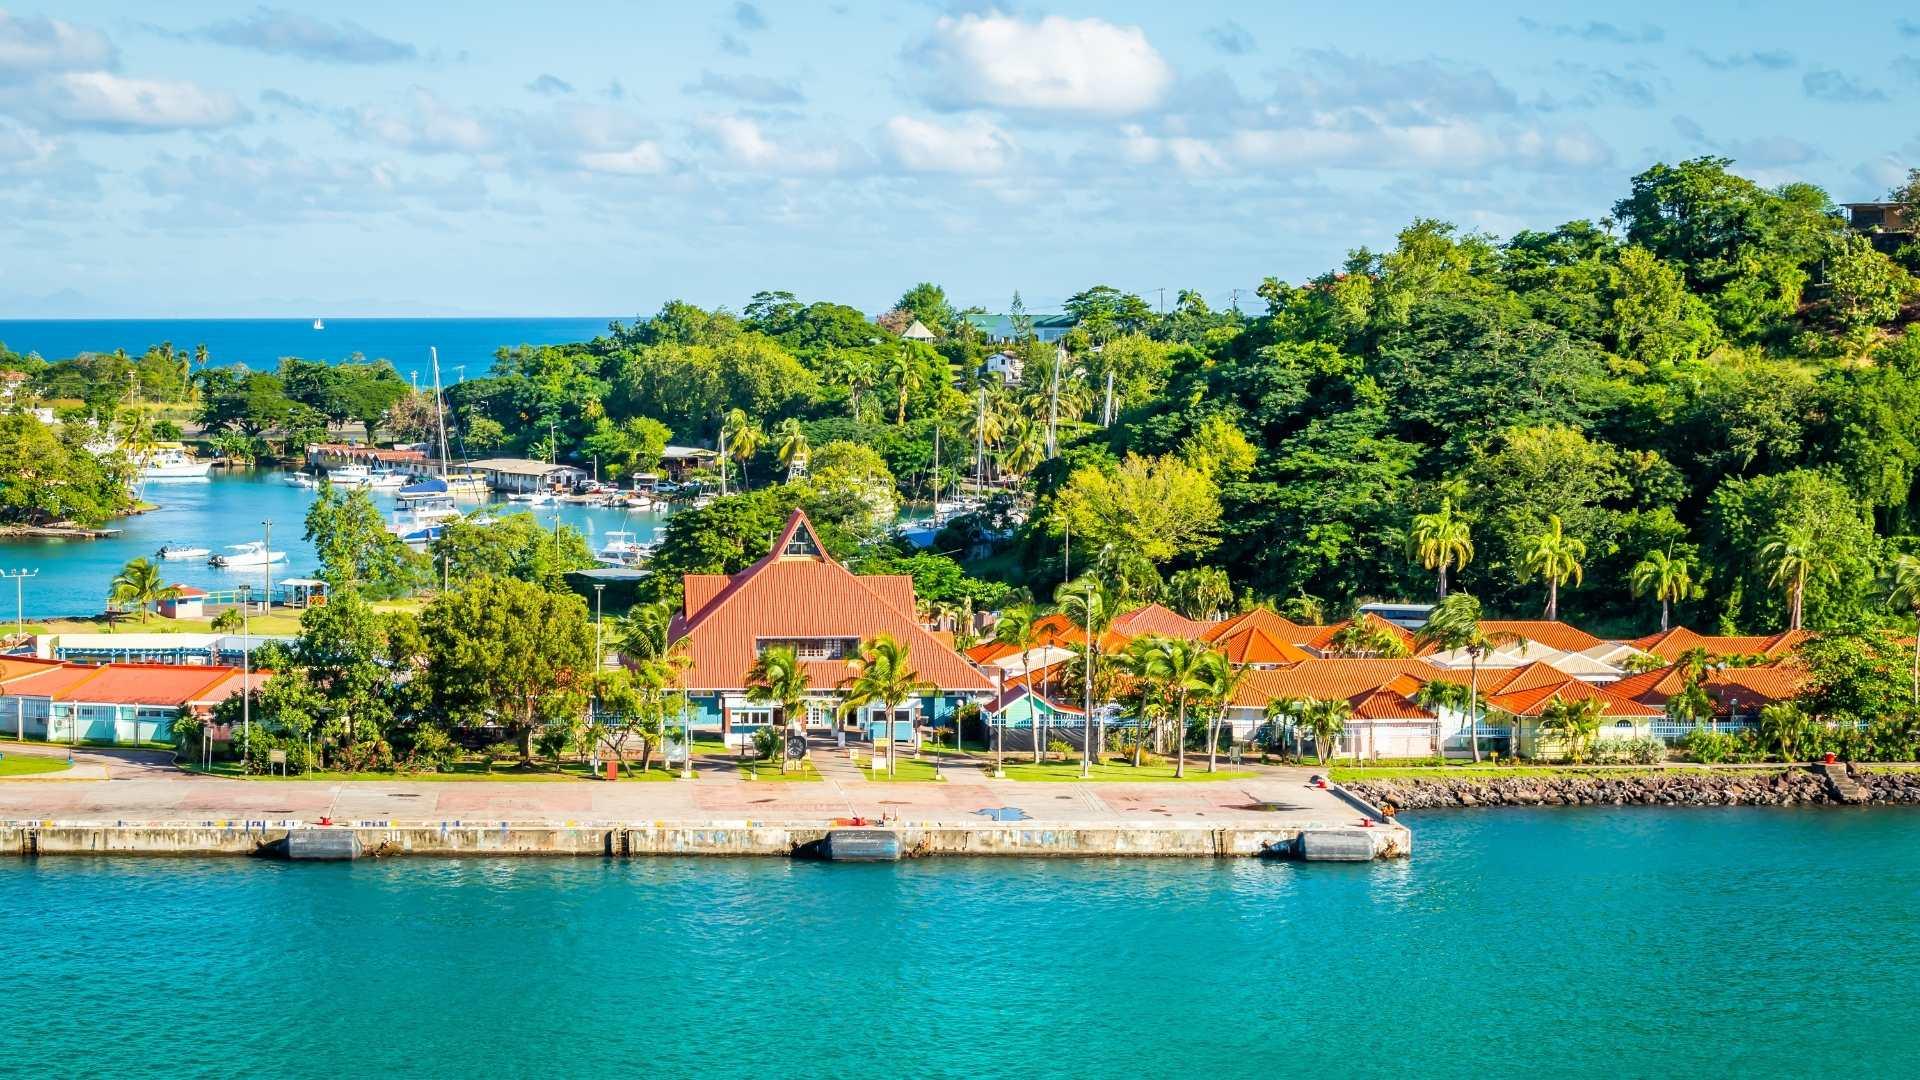 St. Lucia Extends Covid-19 Relief Bond Until 31st December 2021